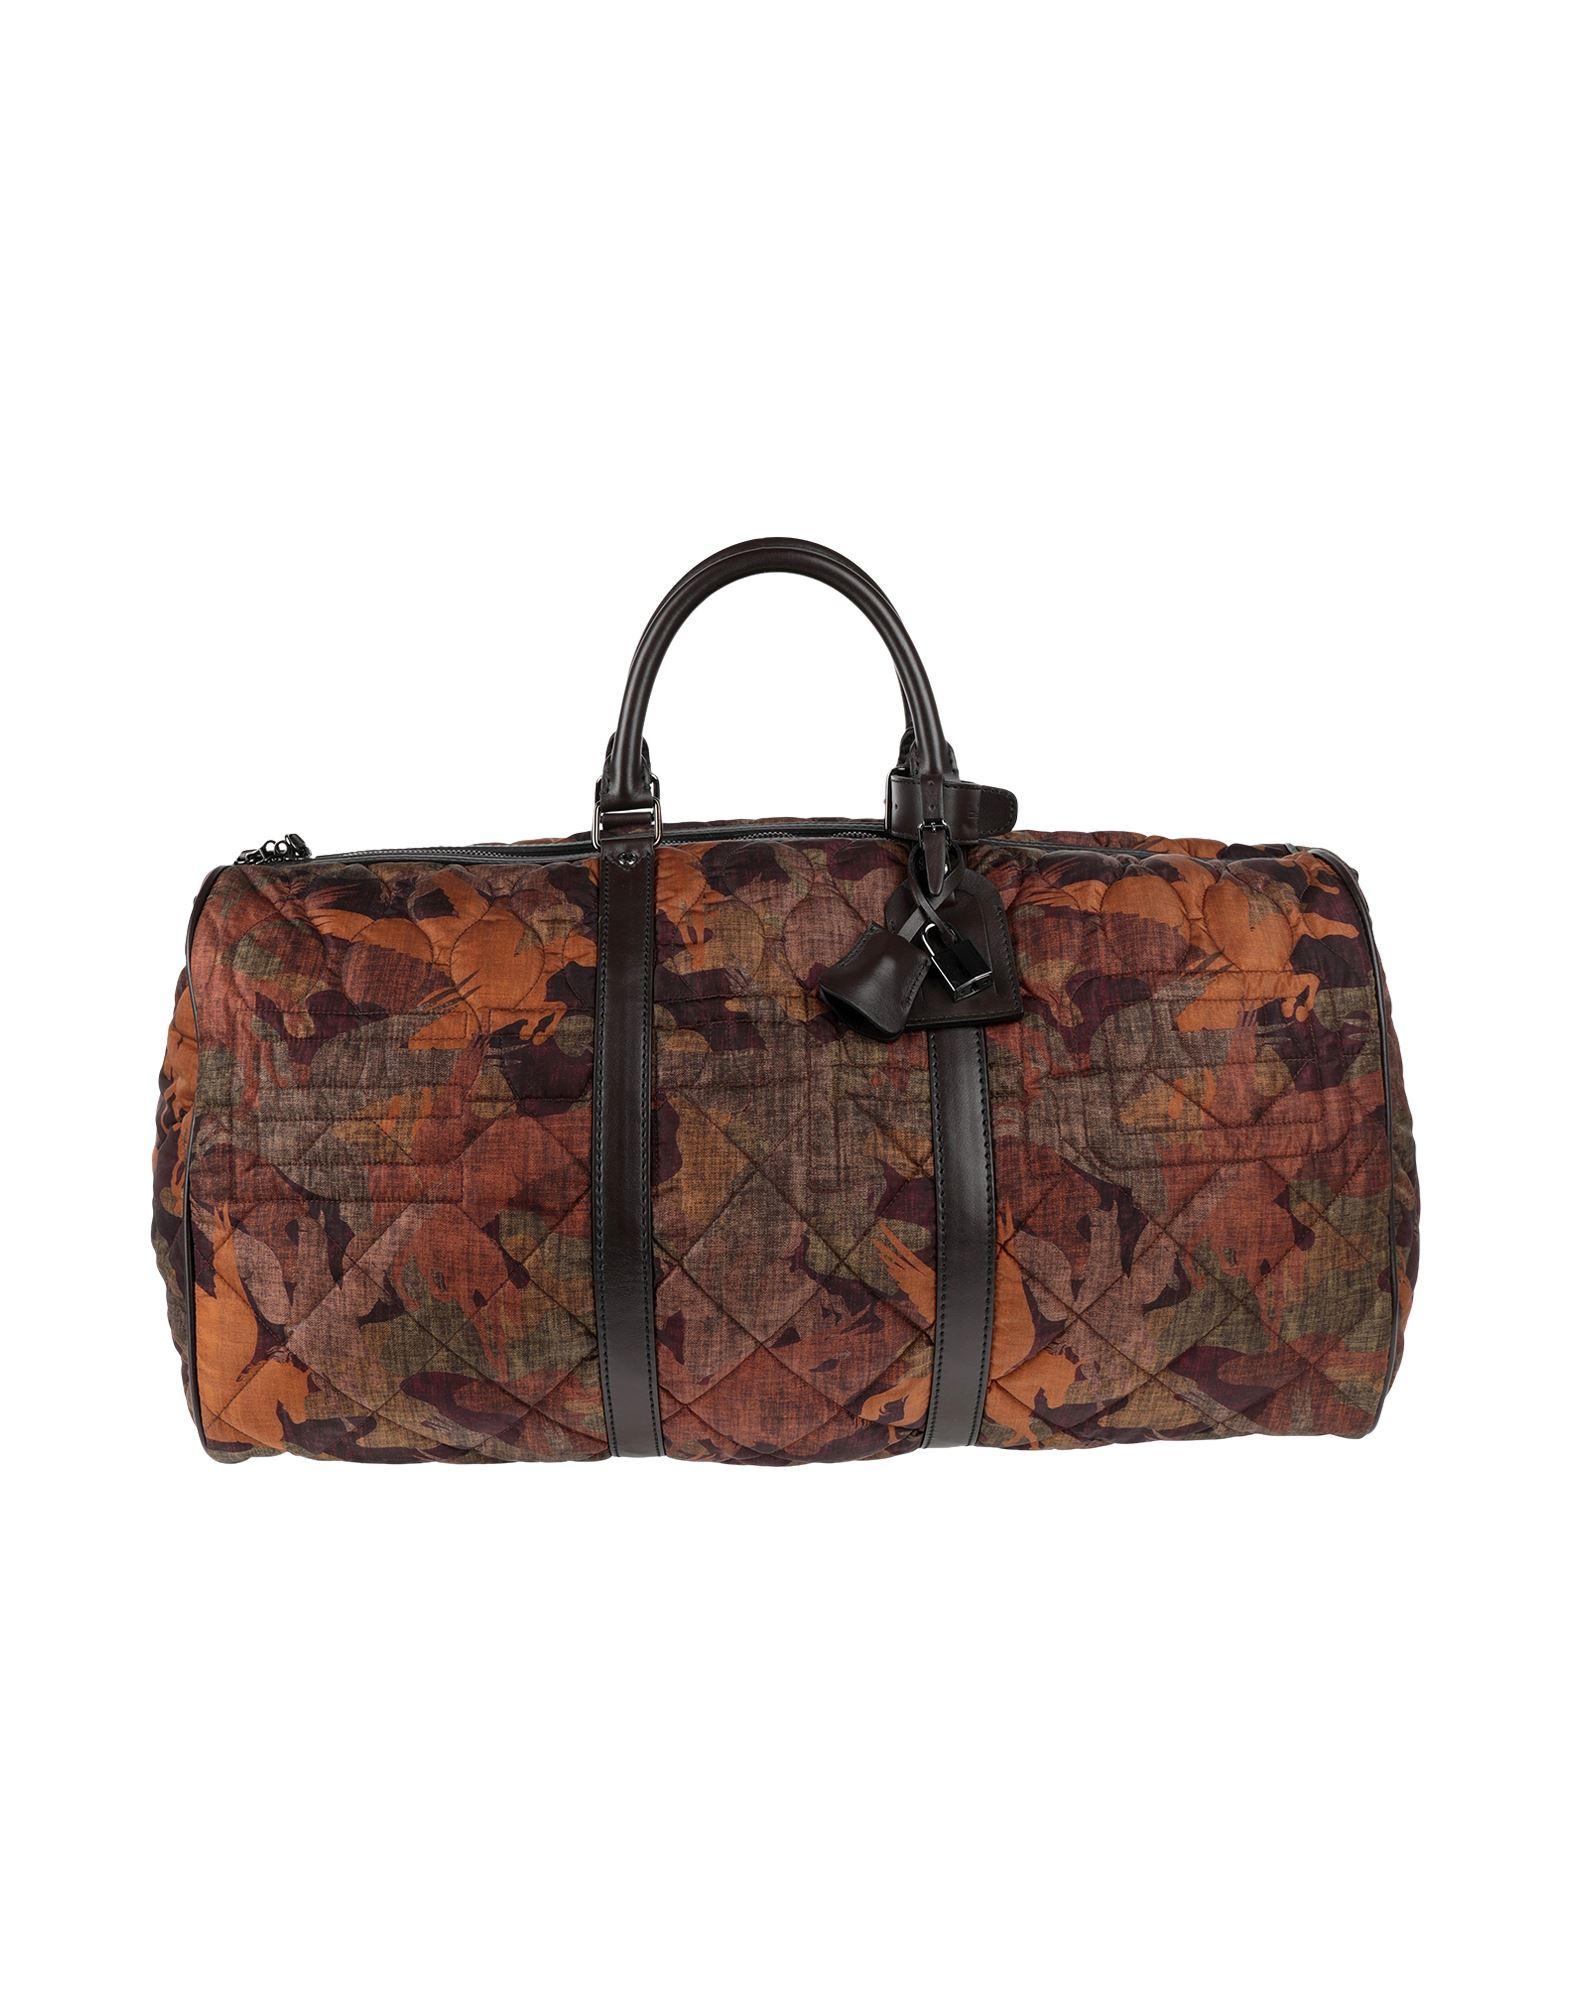 ETRO Travel duffel bags - Item 55020767